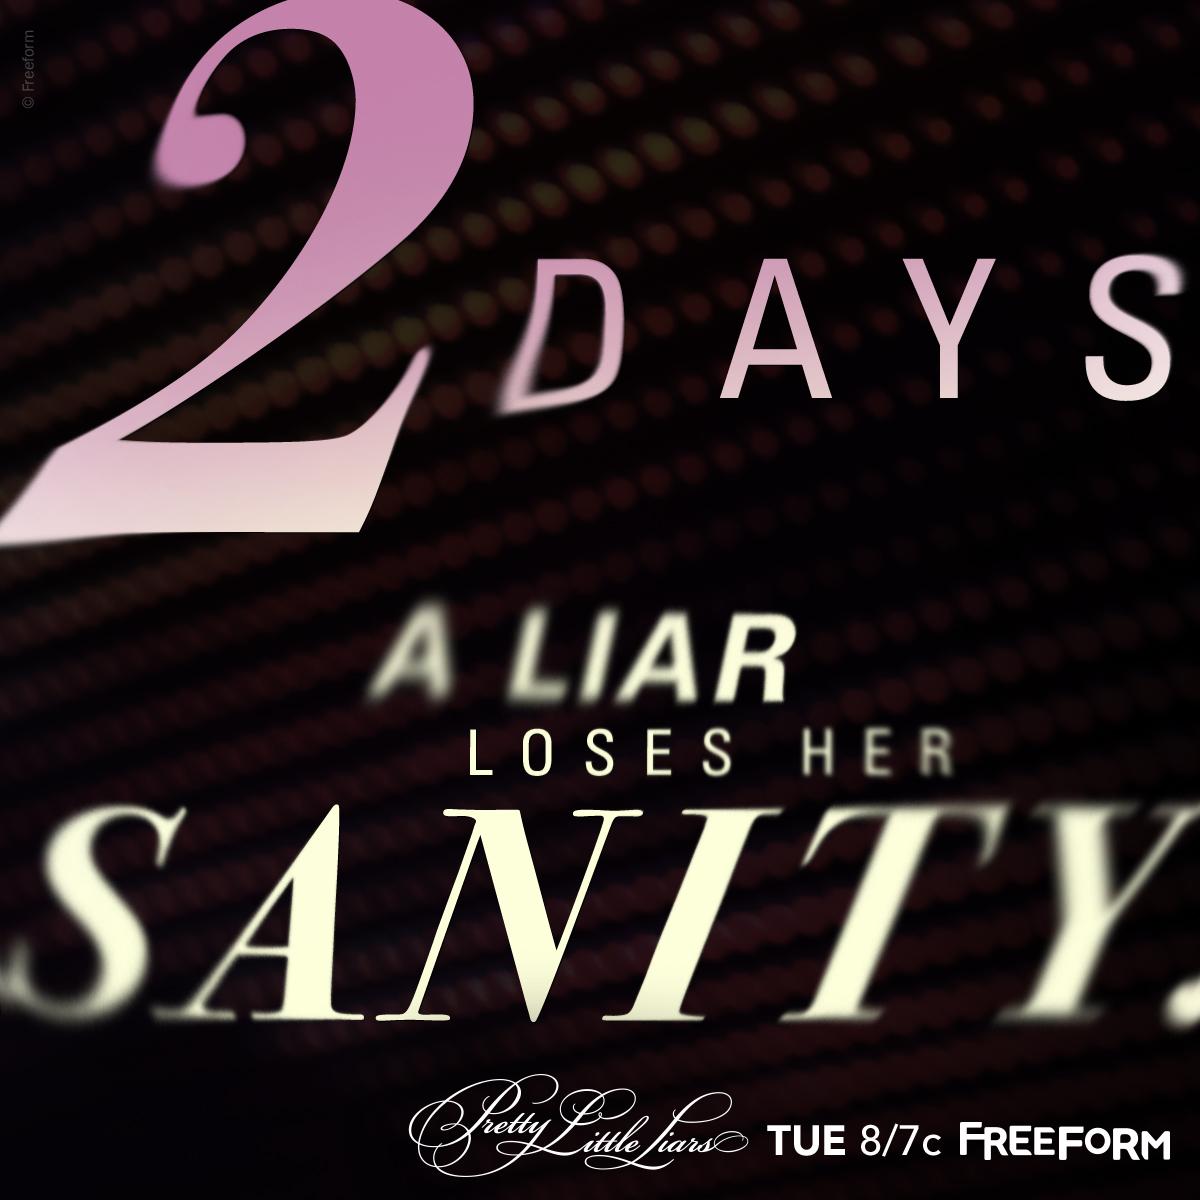 Pretty Little Liars - Here's What We Know Will Happen In The Pretty Little Liars Season 6 Finale! - 1007